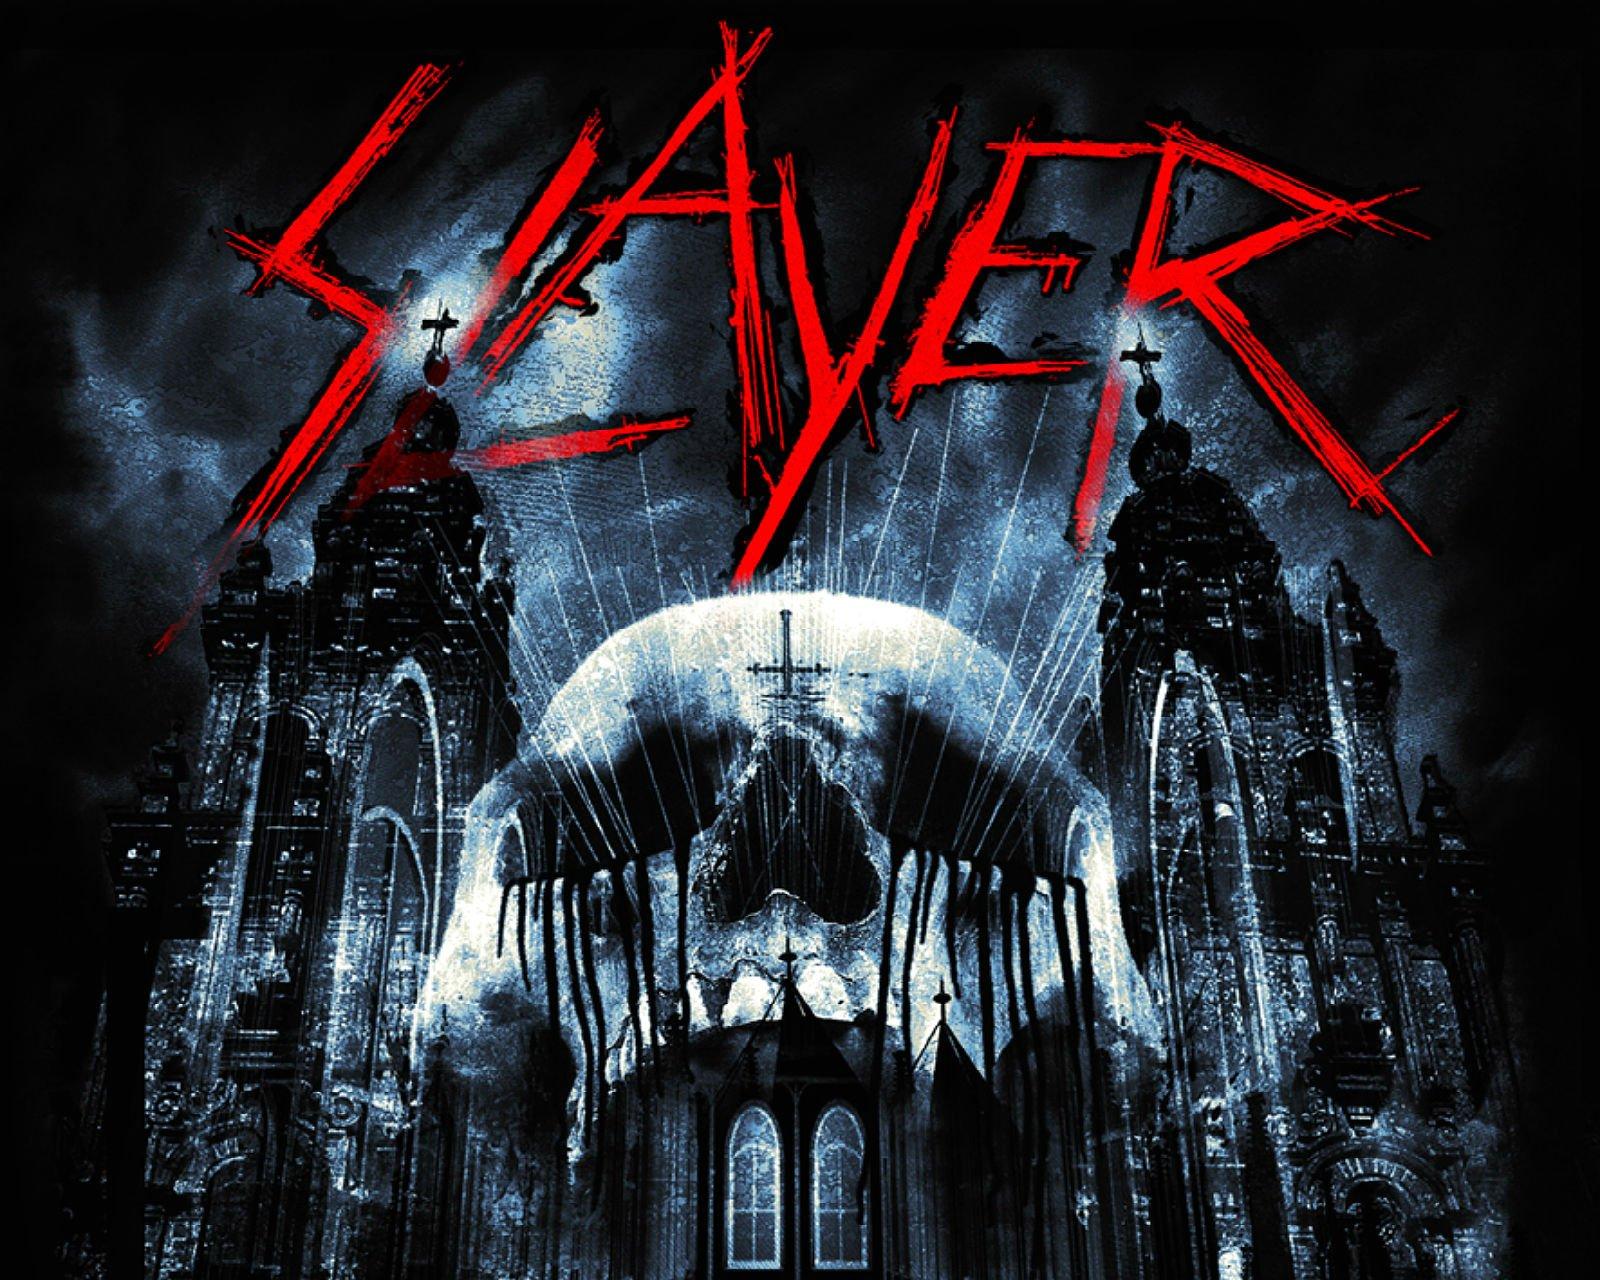 SLAYER death metal heavy thrash skull dark wallpaper 1600x1280 1600x1280